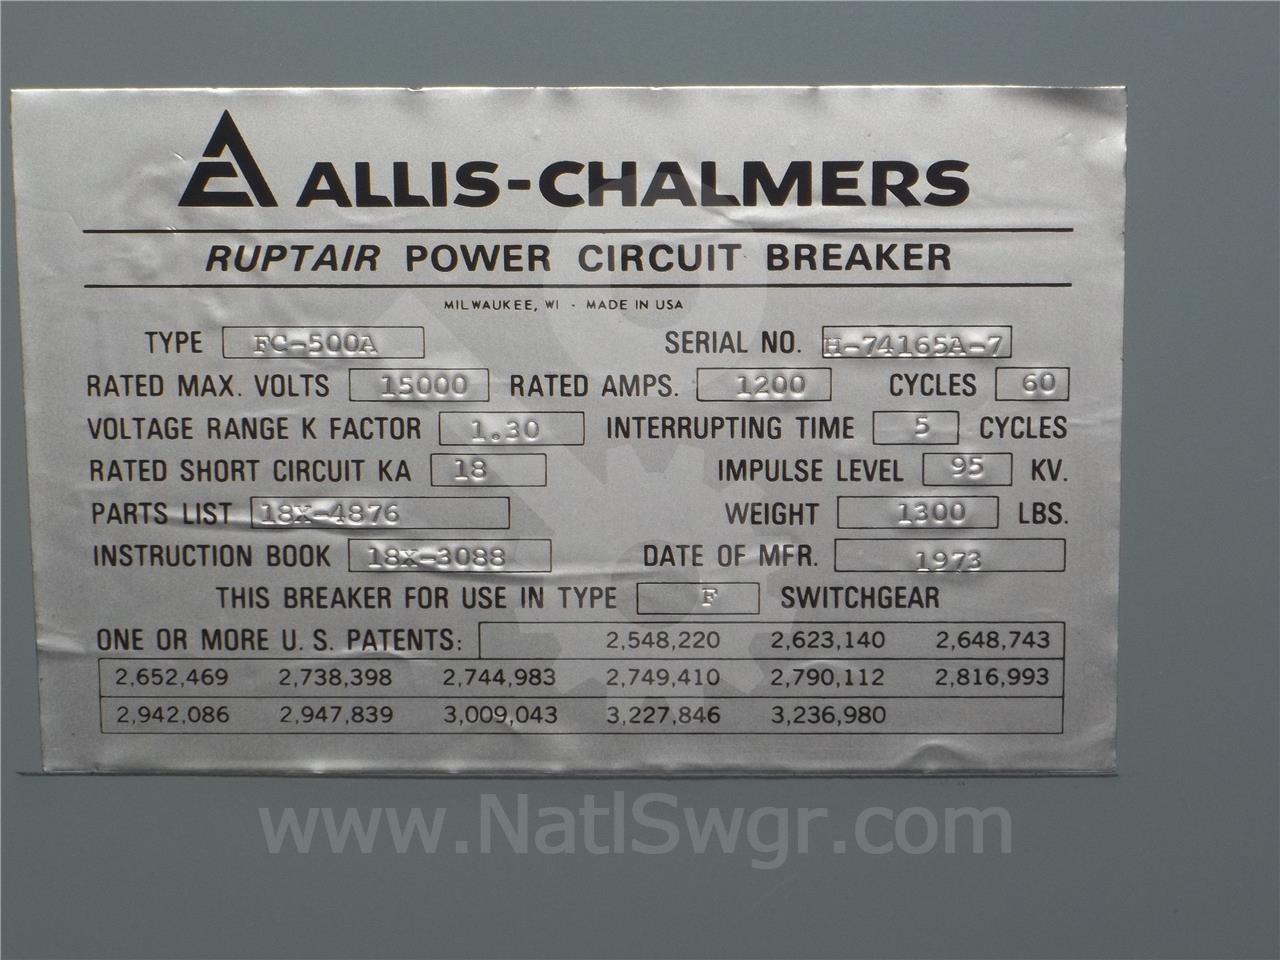 FC500 FC-500A 1200A Siemens / Allis Chalmers SE-3 F1 125VDC CONTROL